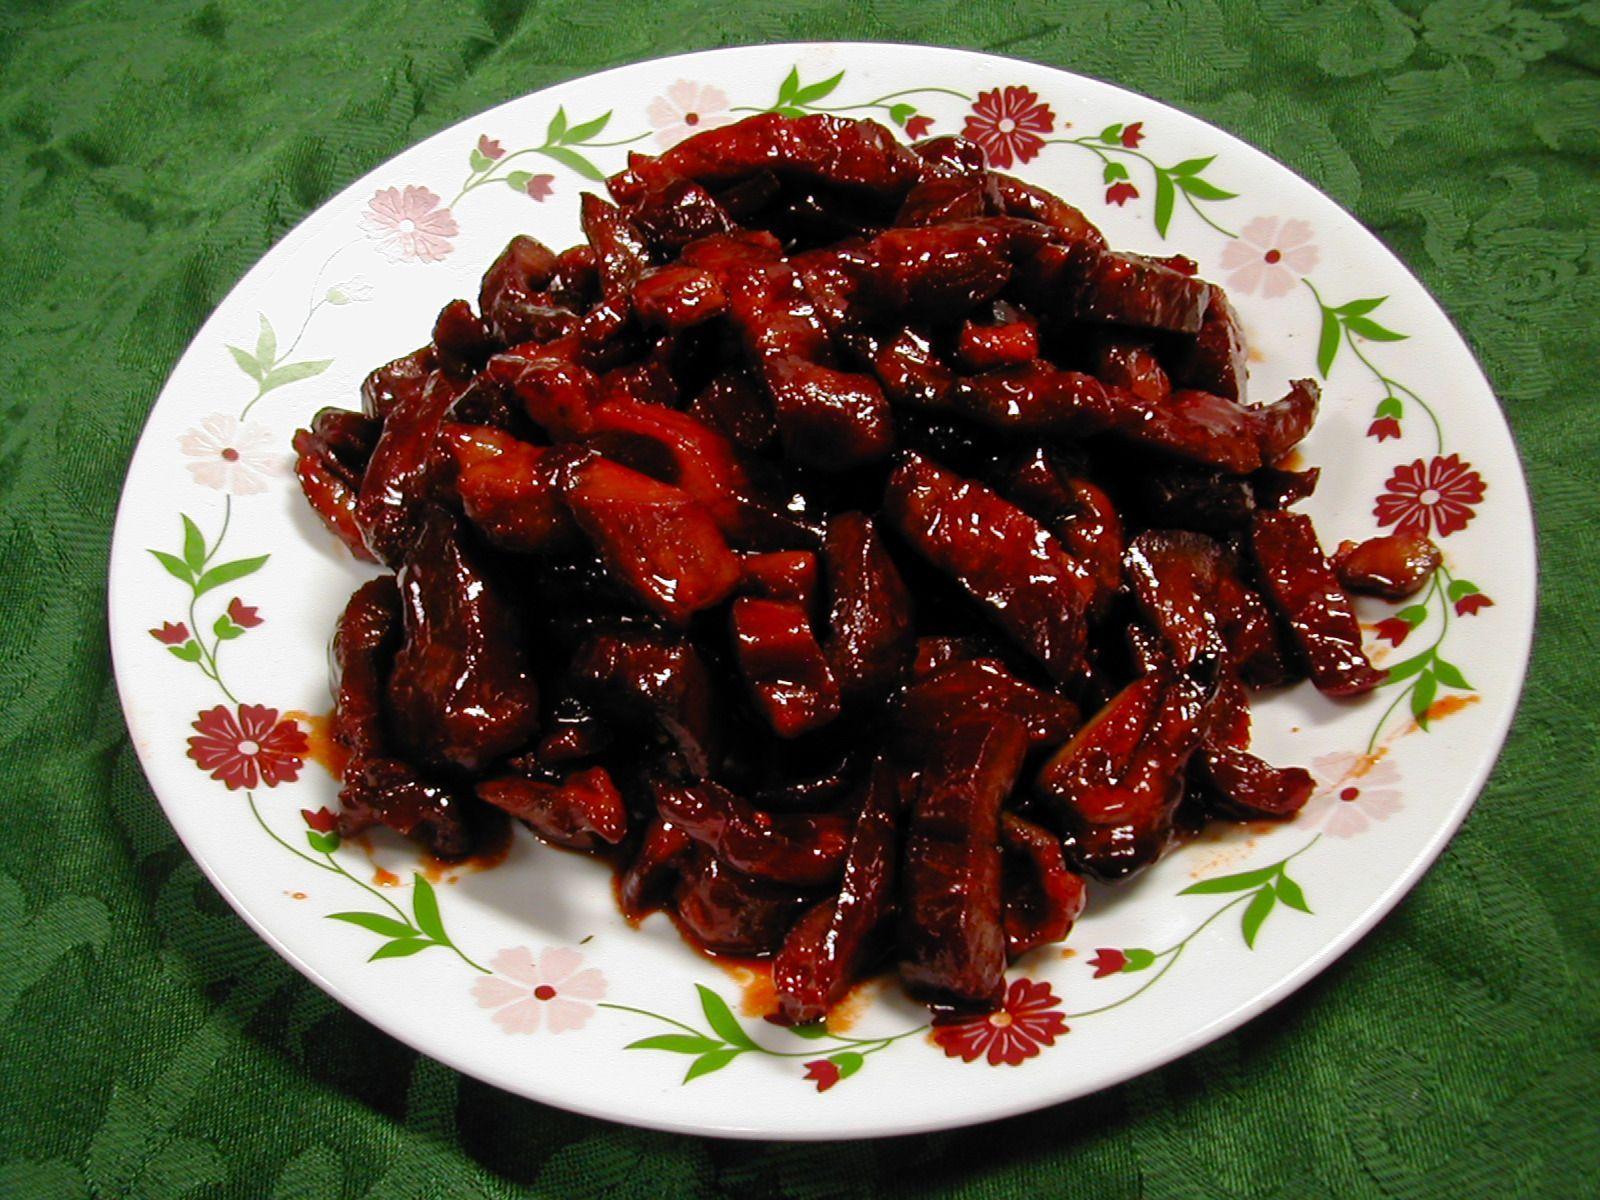 Chinese Style Boneless Ribs Macaroni Kid Macaroni Kid Eats Boneless Ribs Rib Recipes Boneless Ribs Recipe